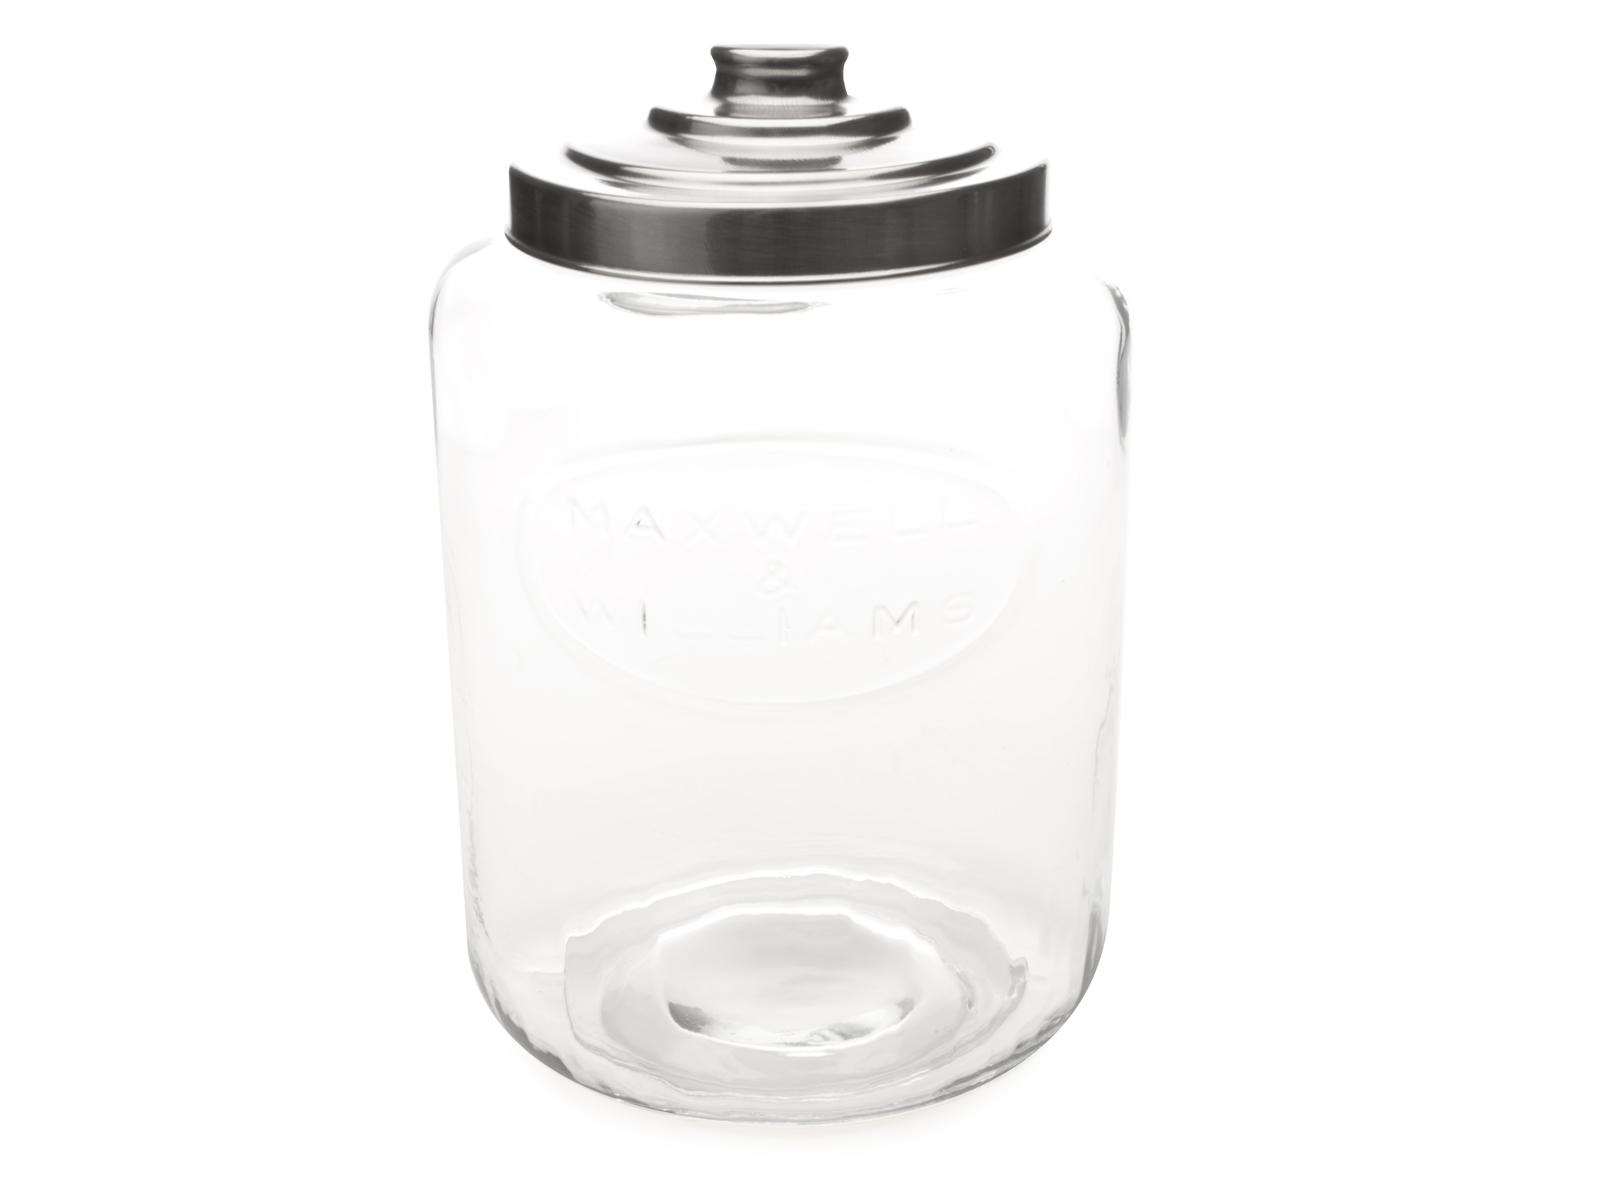 Maxwell & Williams - Glass Candy Jar (6L) image